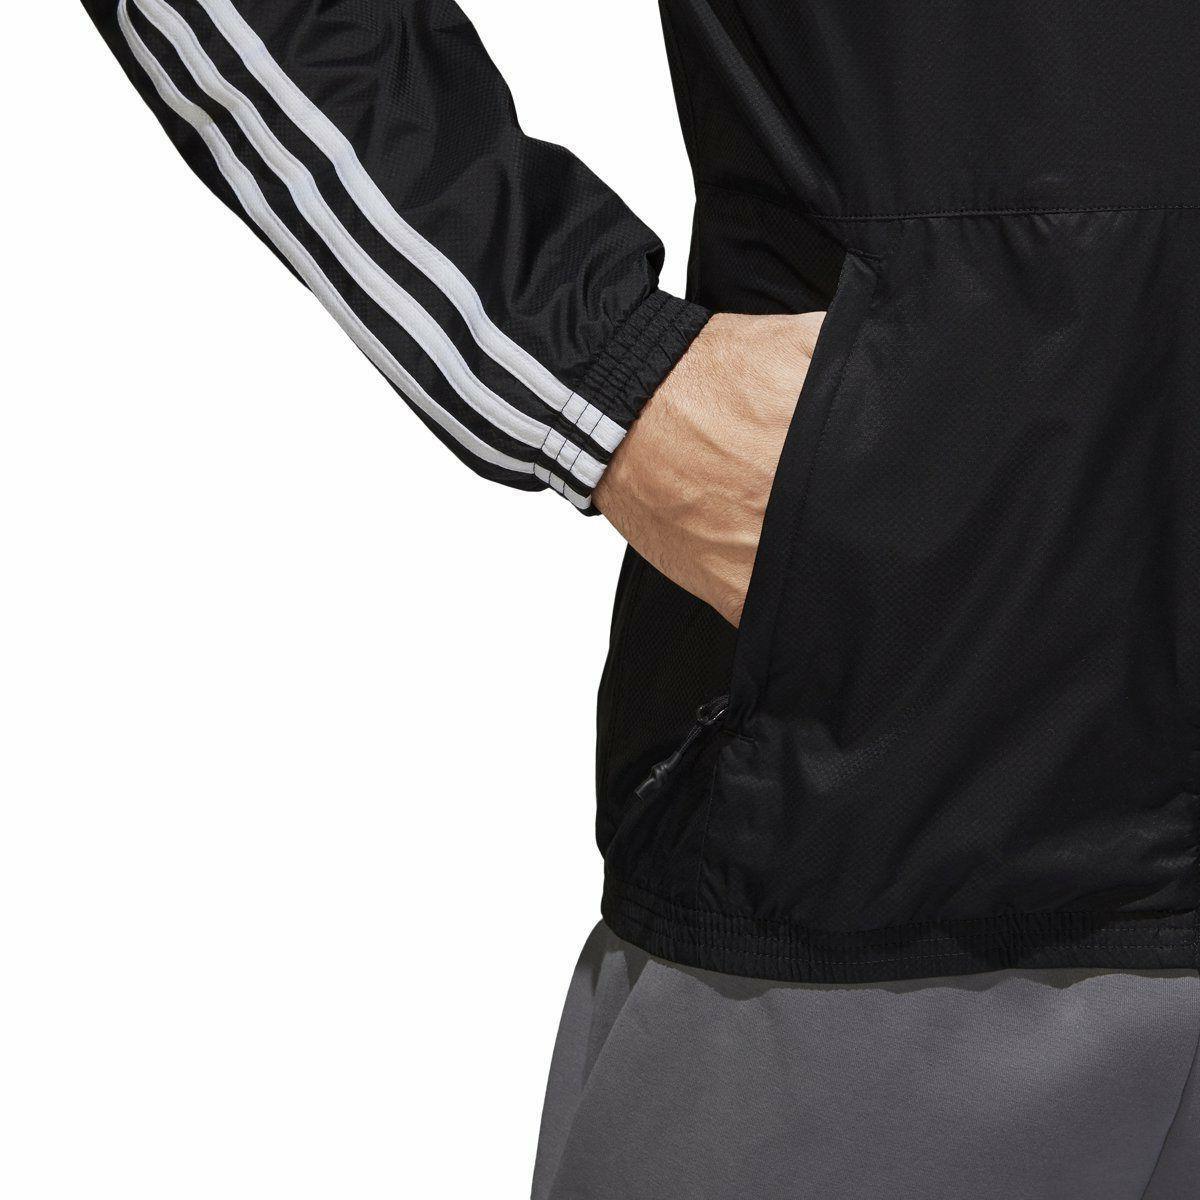 Adidas Wind Black / White